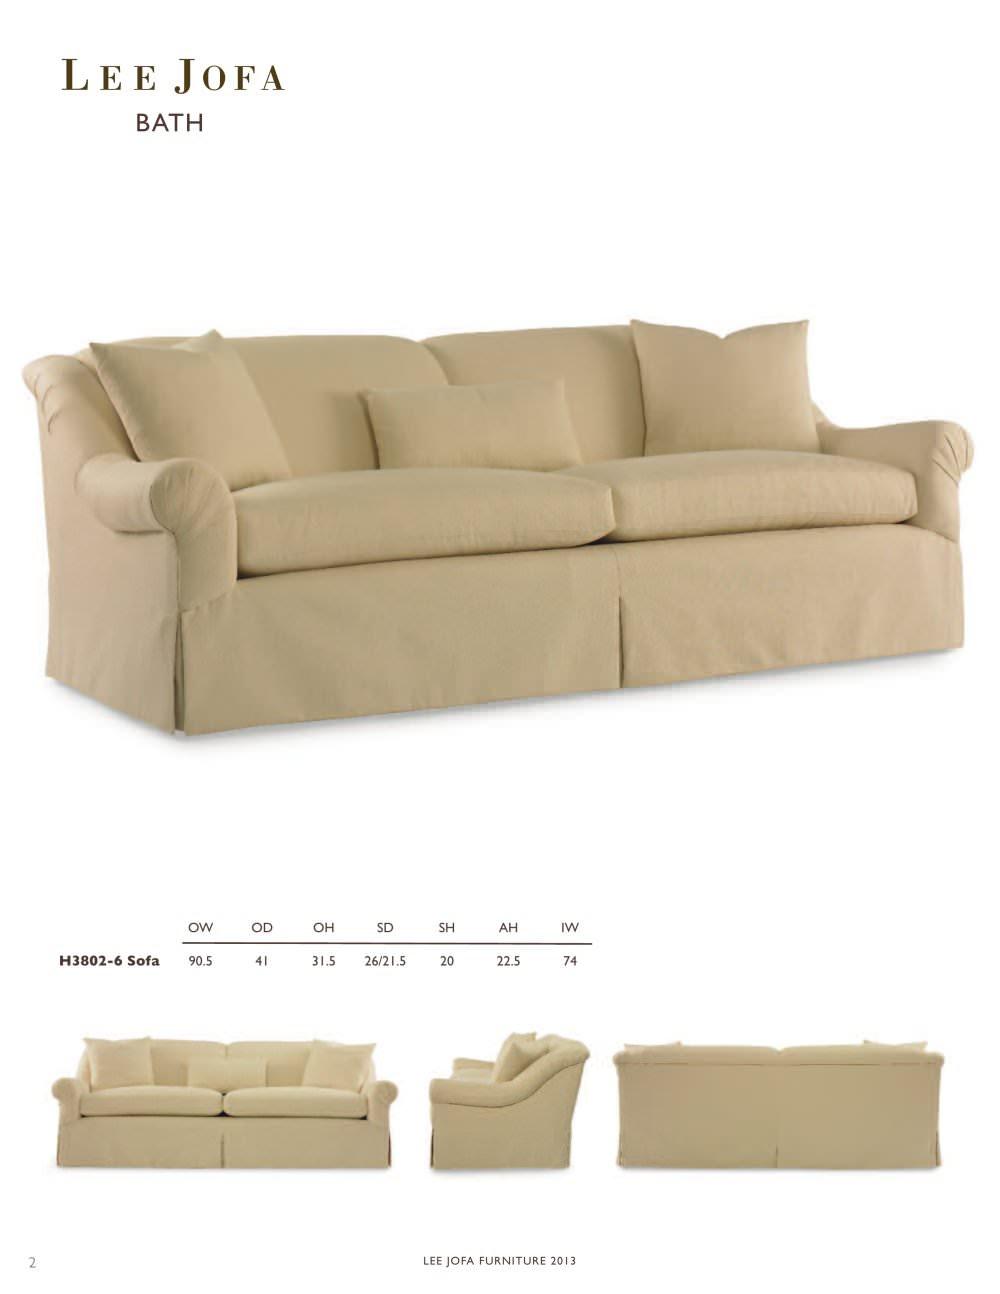 Lee Jofa-Furniture CATALOG 2013 - Lee Jofa - Page n° 12 - PDF ...